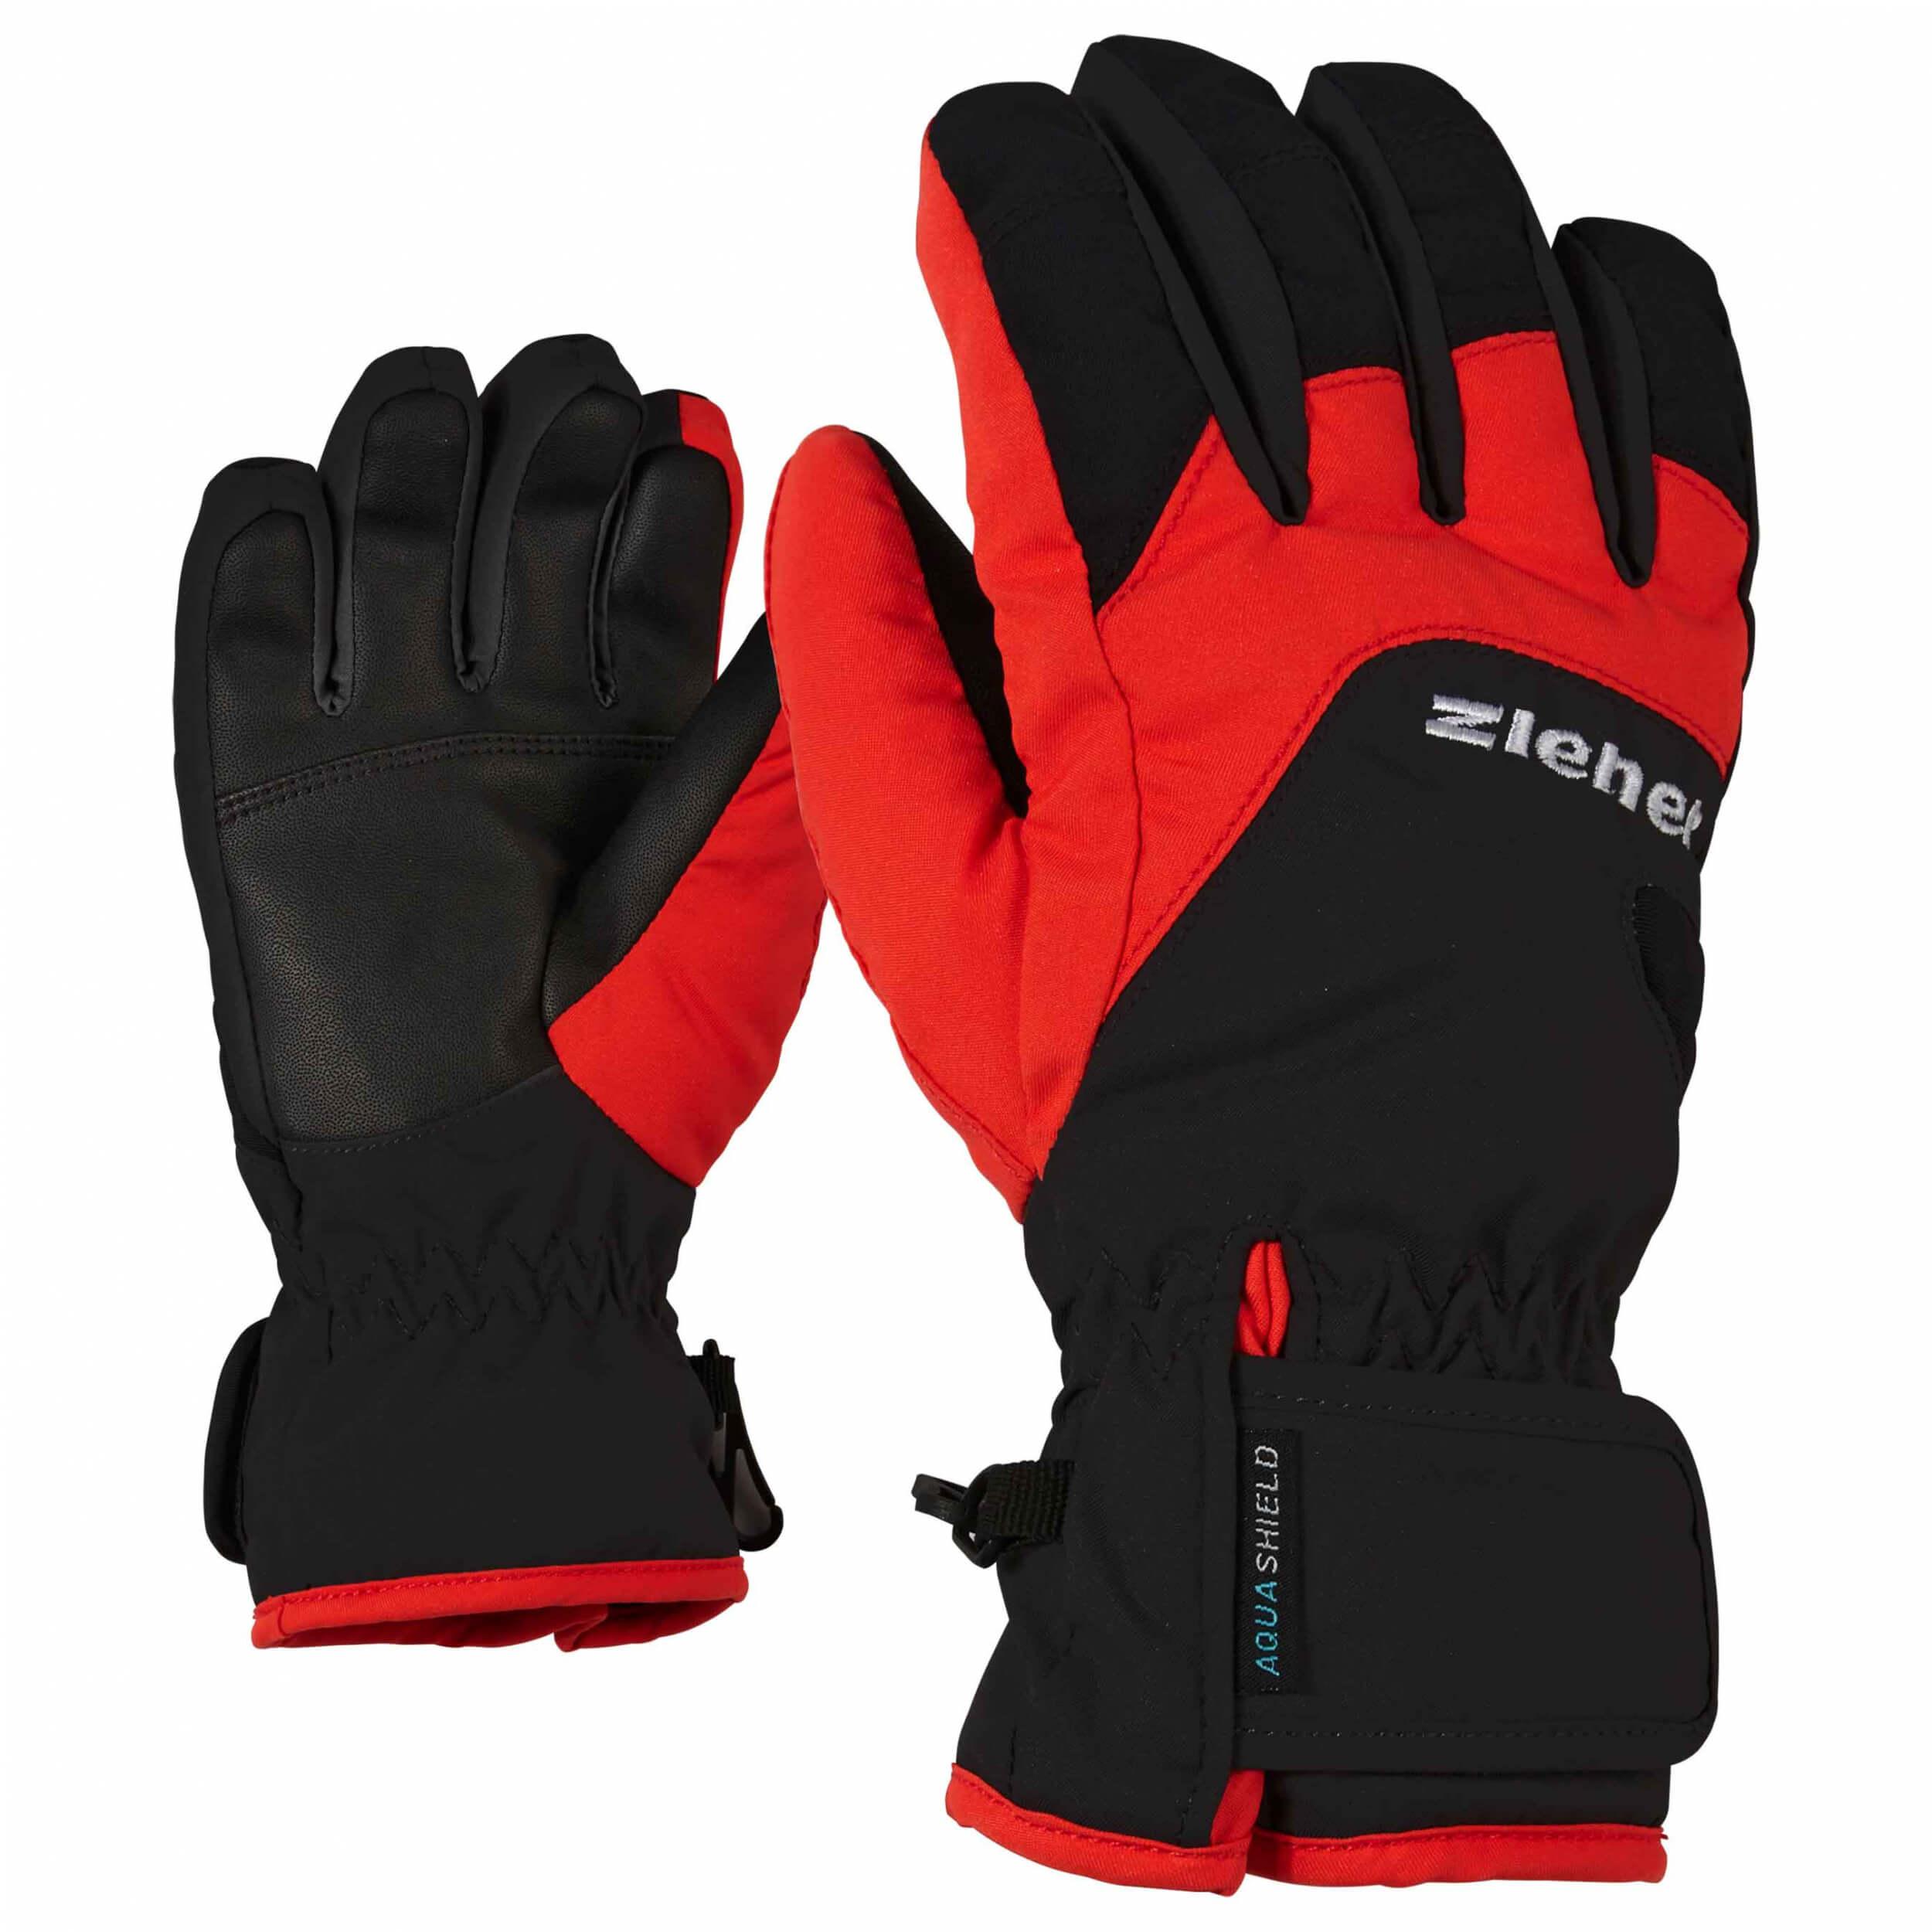 ZIENER Kinder Handschuhe AQUASHIELD Lizzard schwarz rot 12888